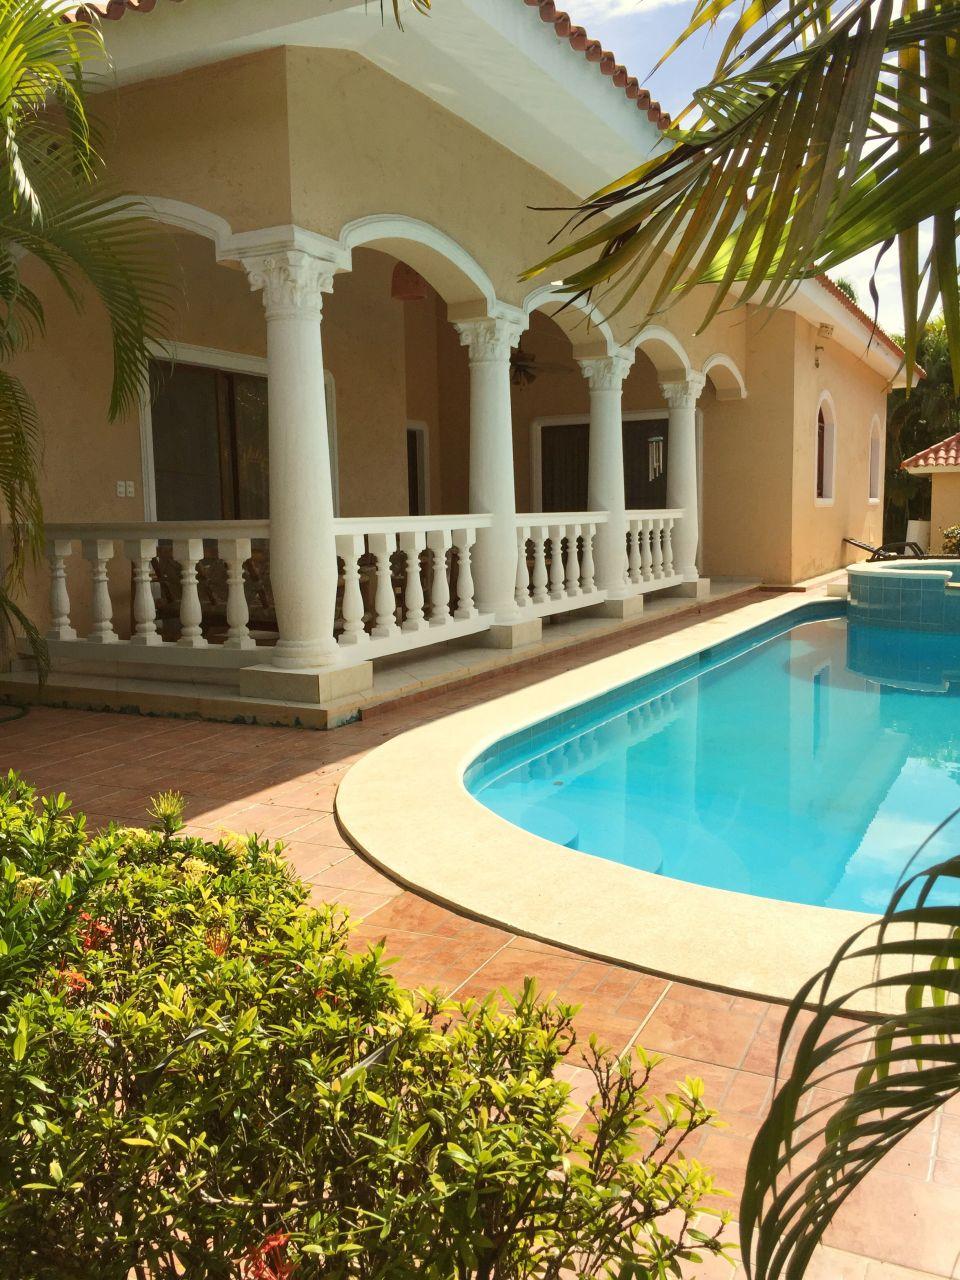 Вилла в Кабарете, Доминиканская Республика, 865 м2 - фото 1